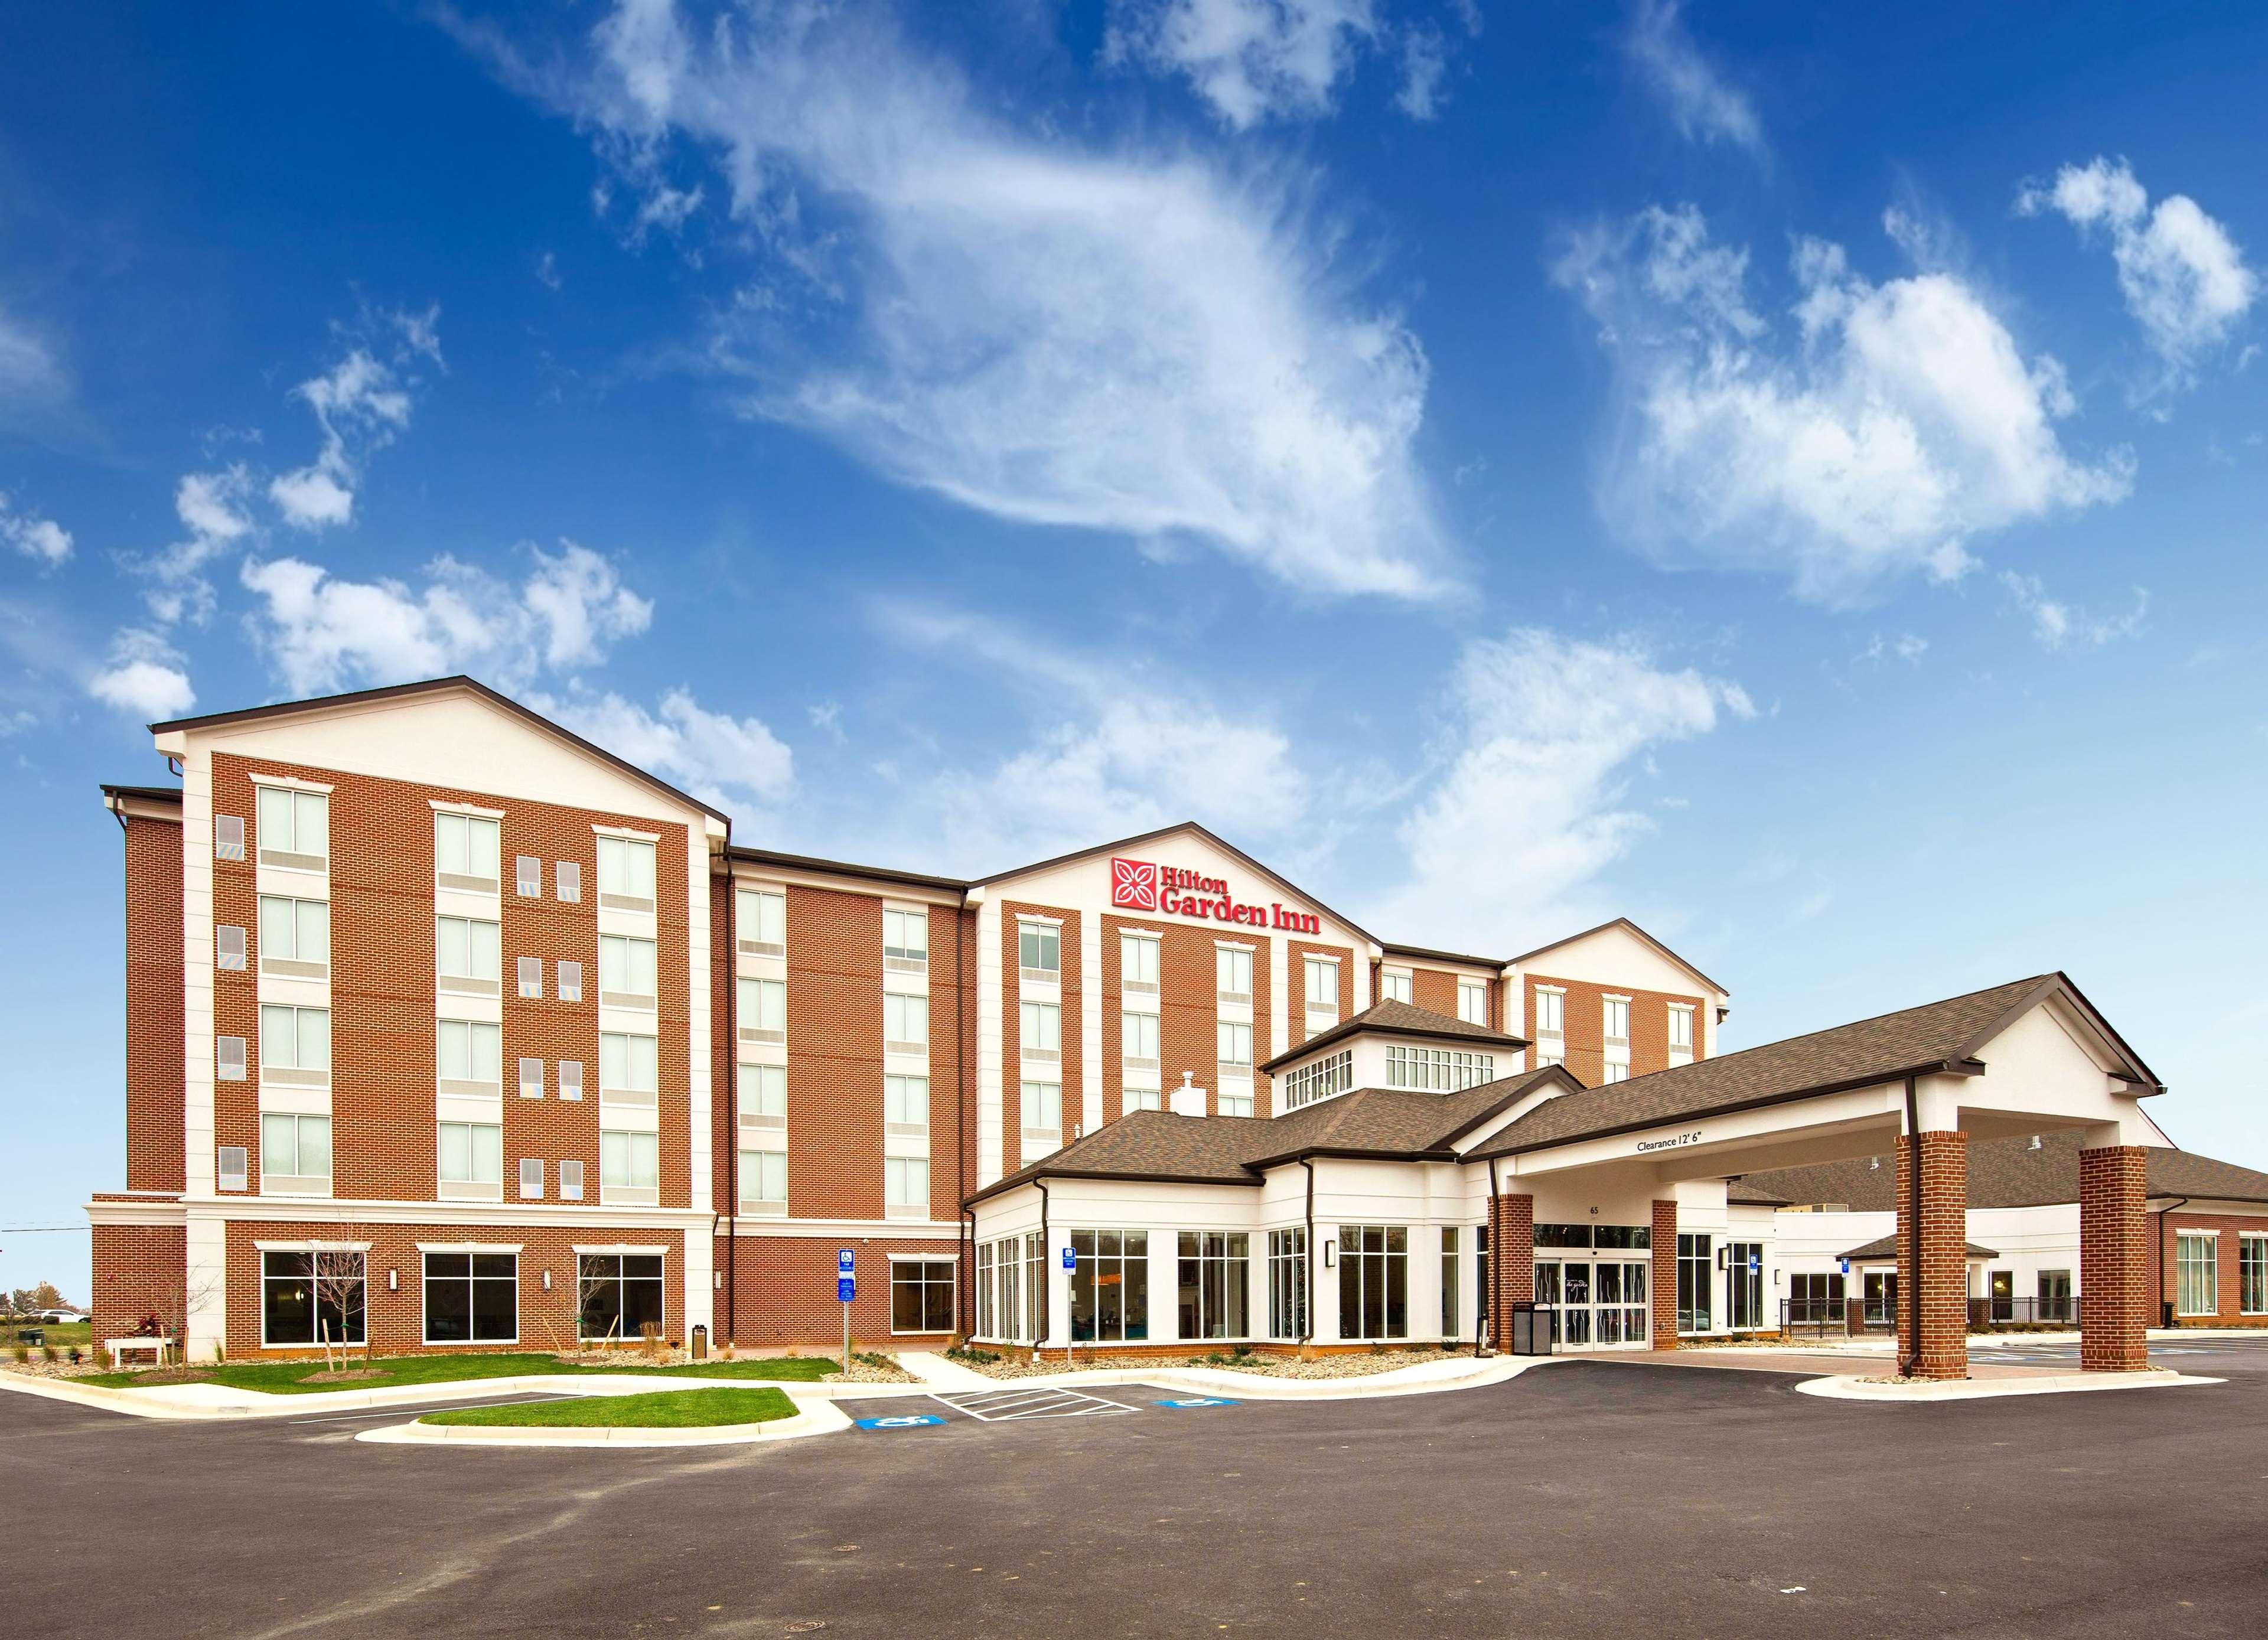 Hilton Garden Inn Martinsburg Martinsburg West Virginia Wv